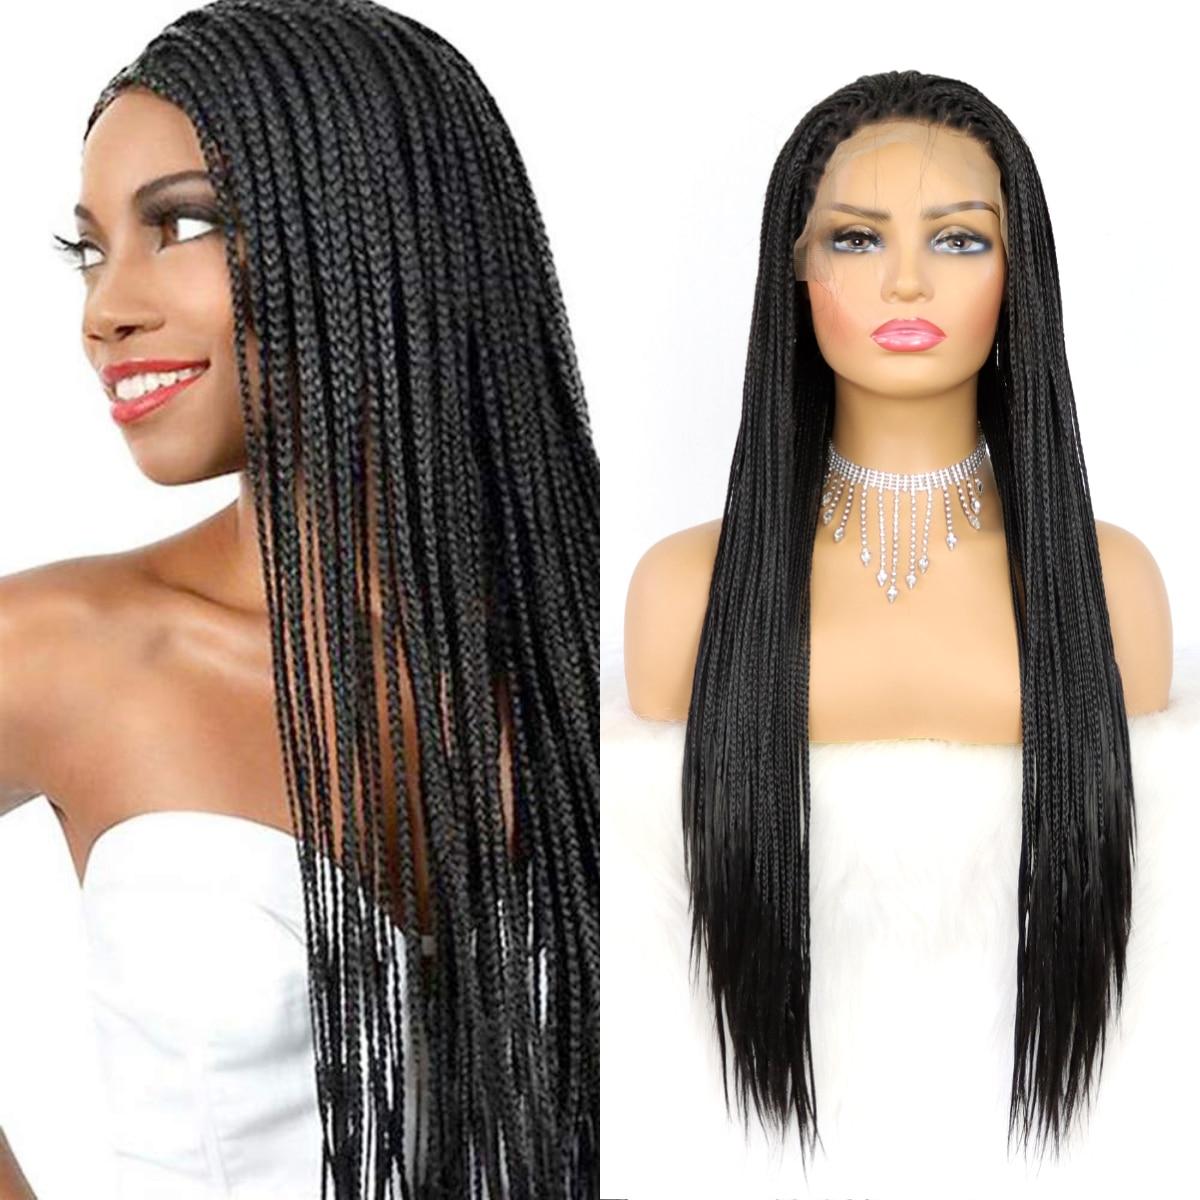 Black Braids Synthetic Lace Front Wigs For Women Heat Resistant Fiber Hair